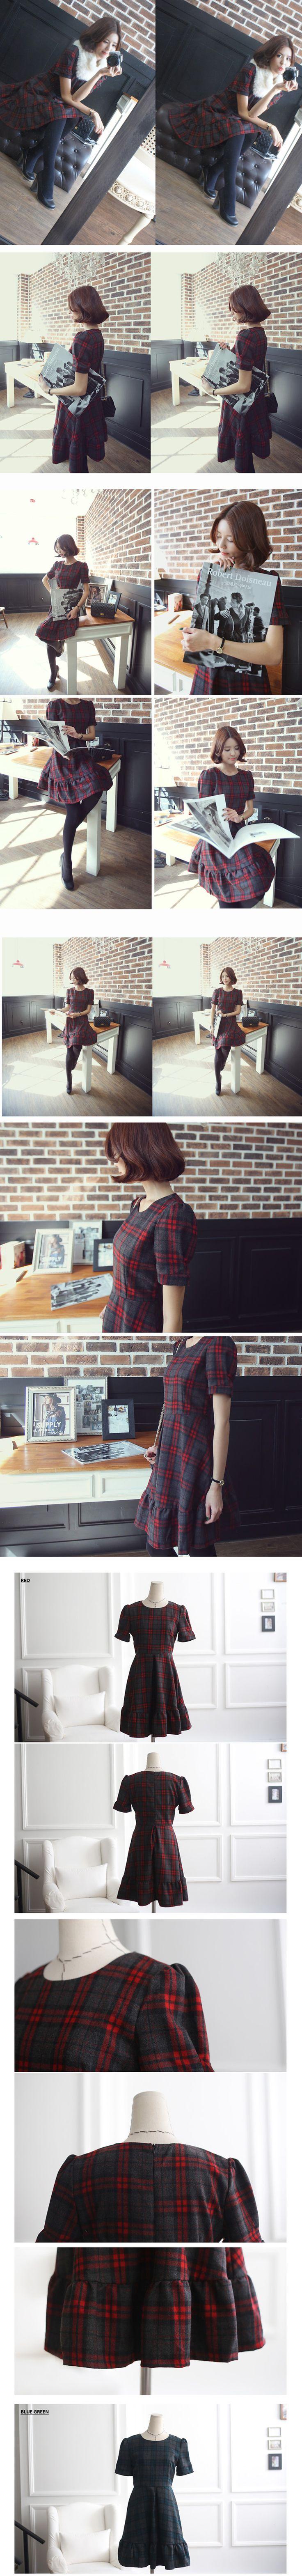 ba) チェックホリックワンピース(2色) - 韓国ファッション通販【セレクトショップKii-Na】キーナ